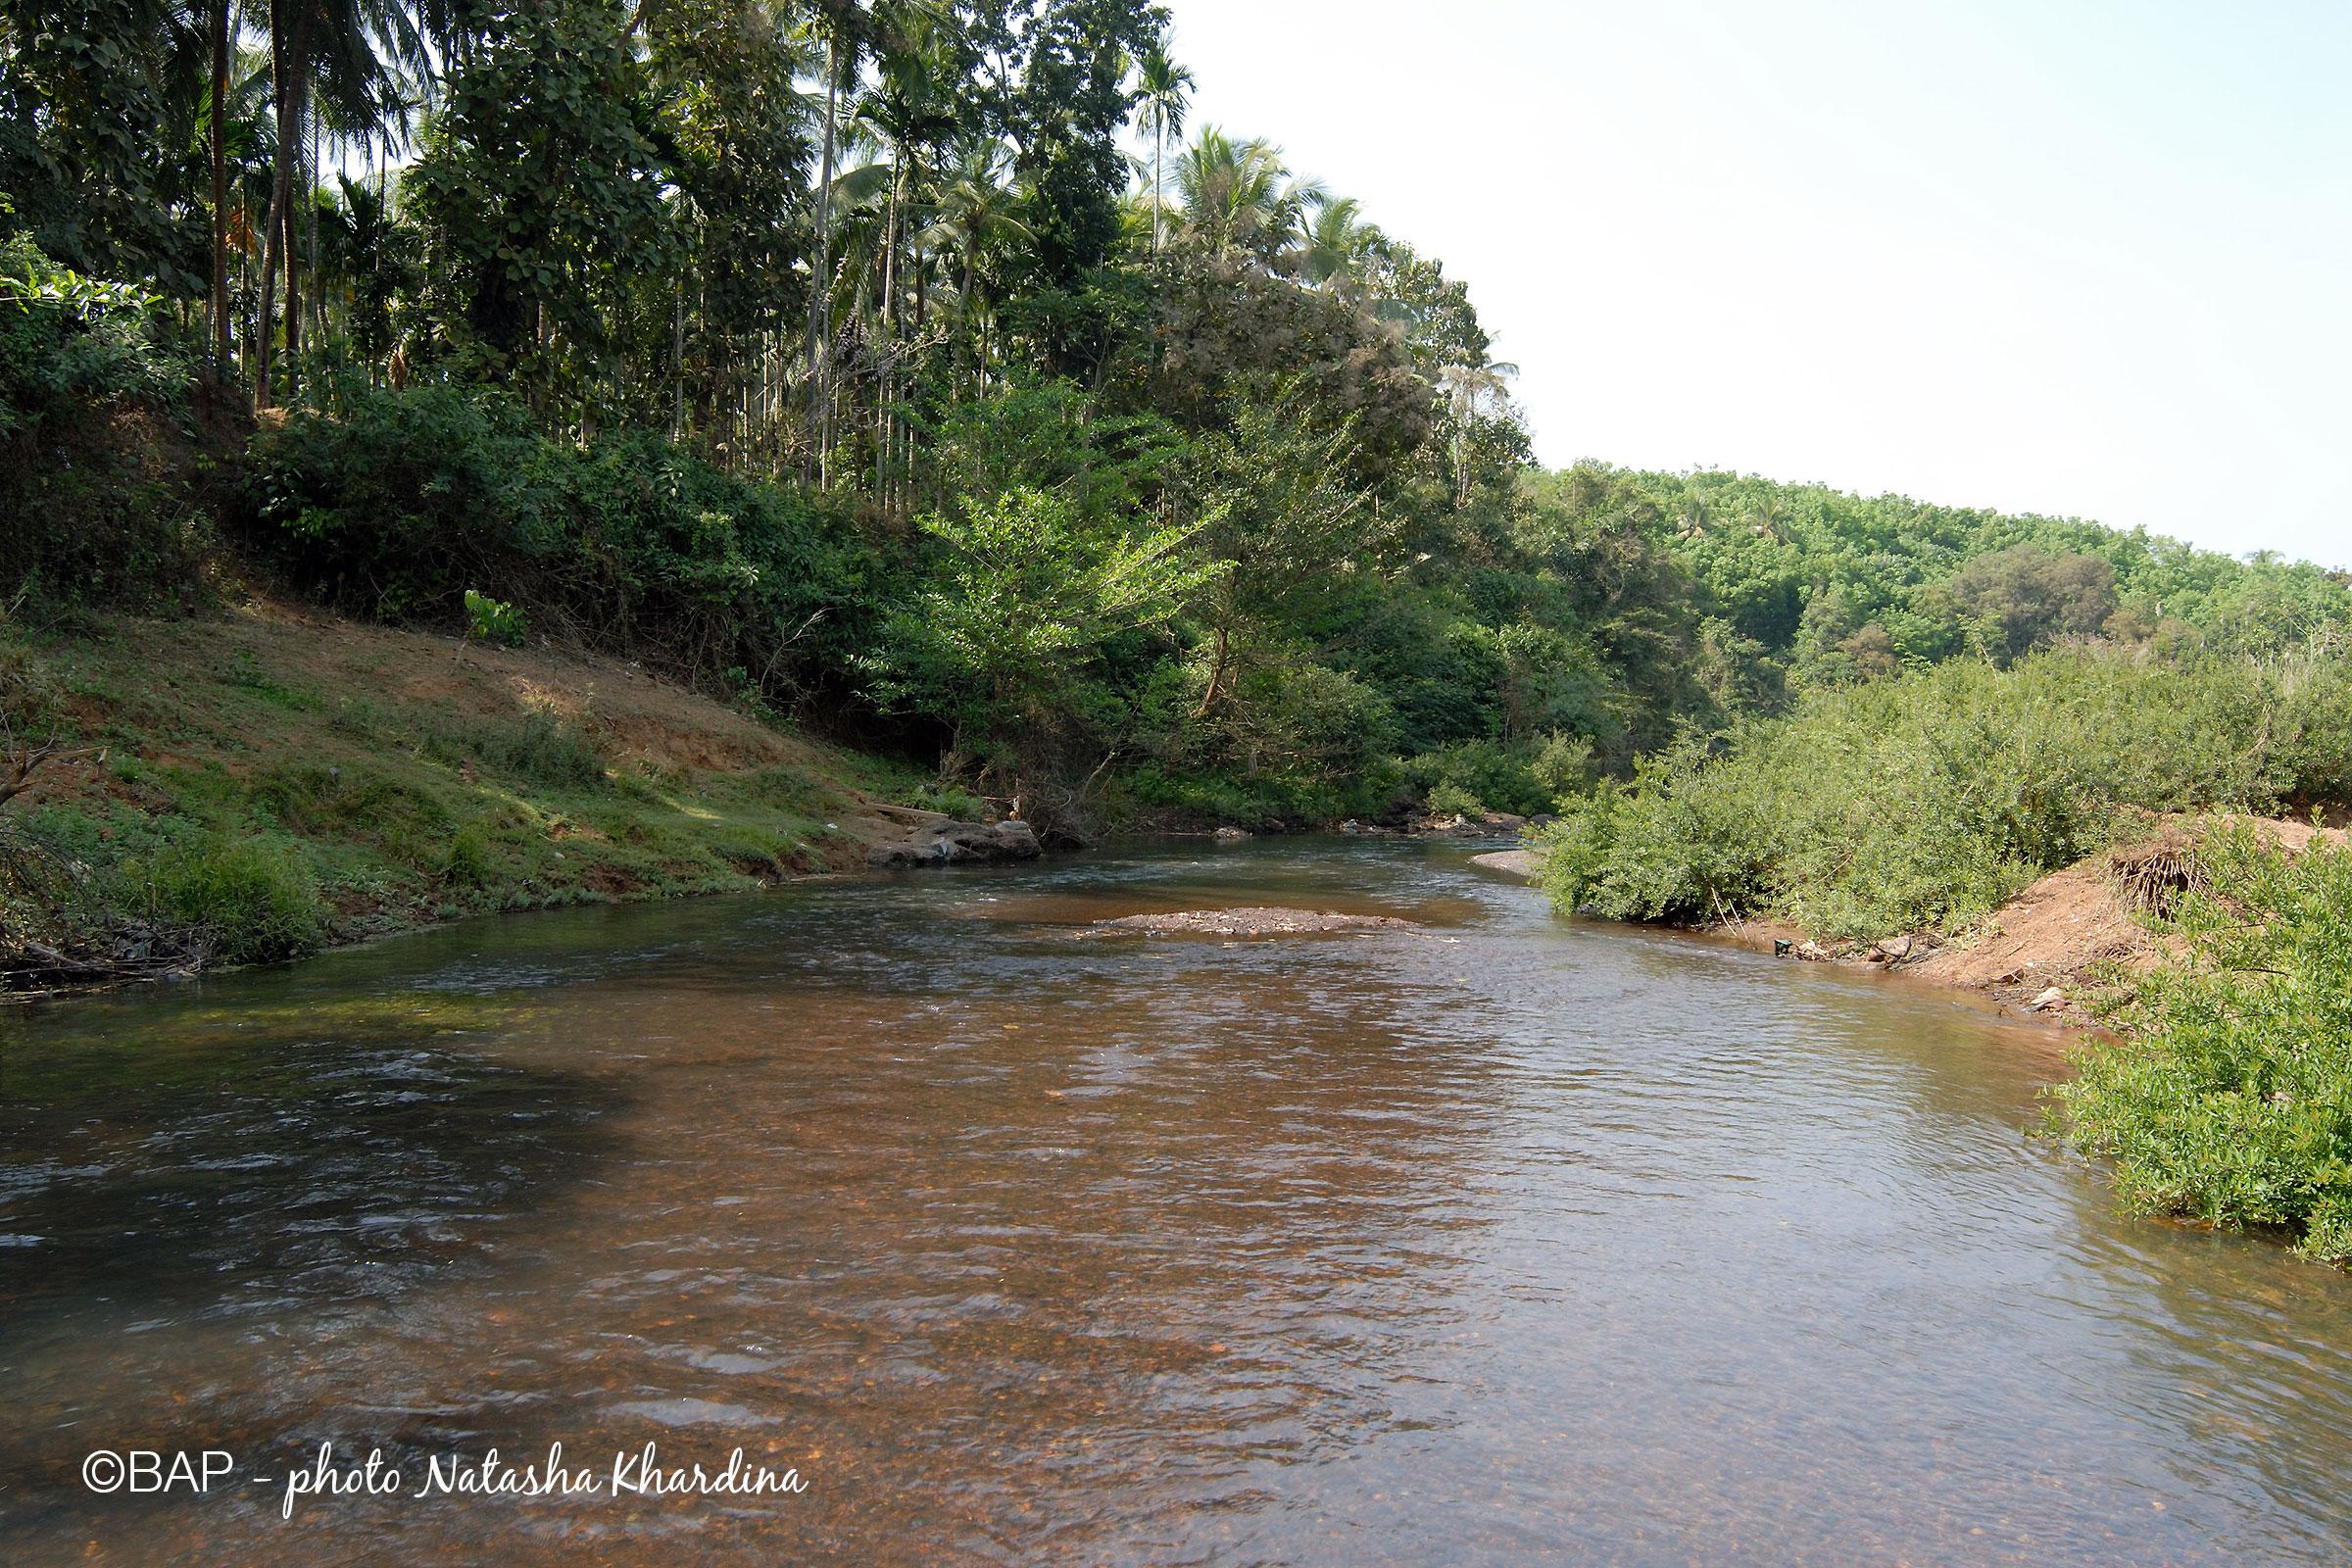 BIN Meruvambayi River, Kerala. ©BAP, photo N.Khardina